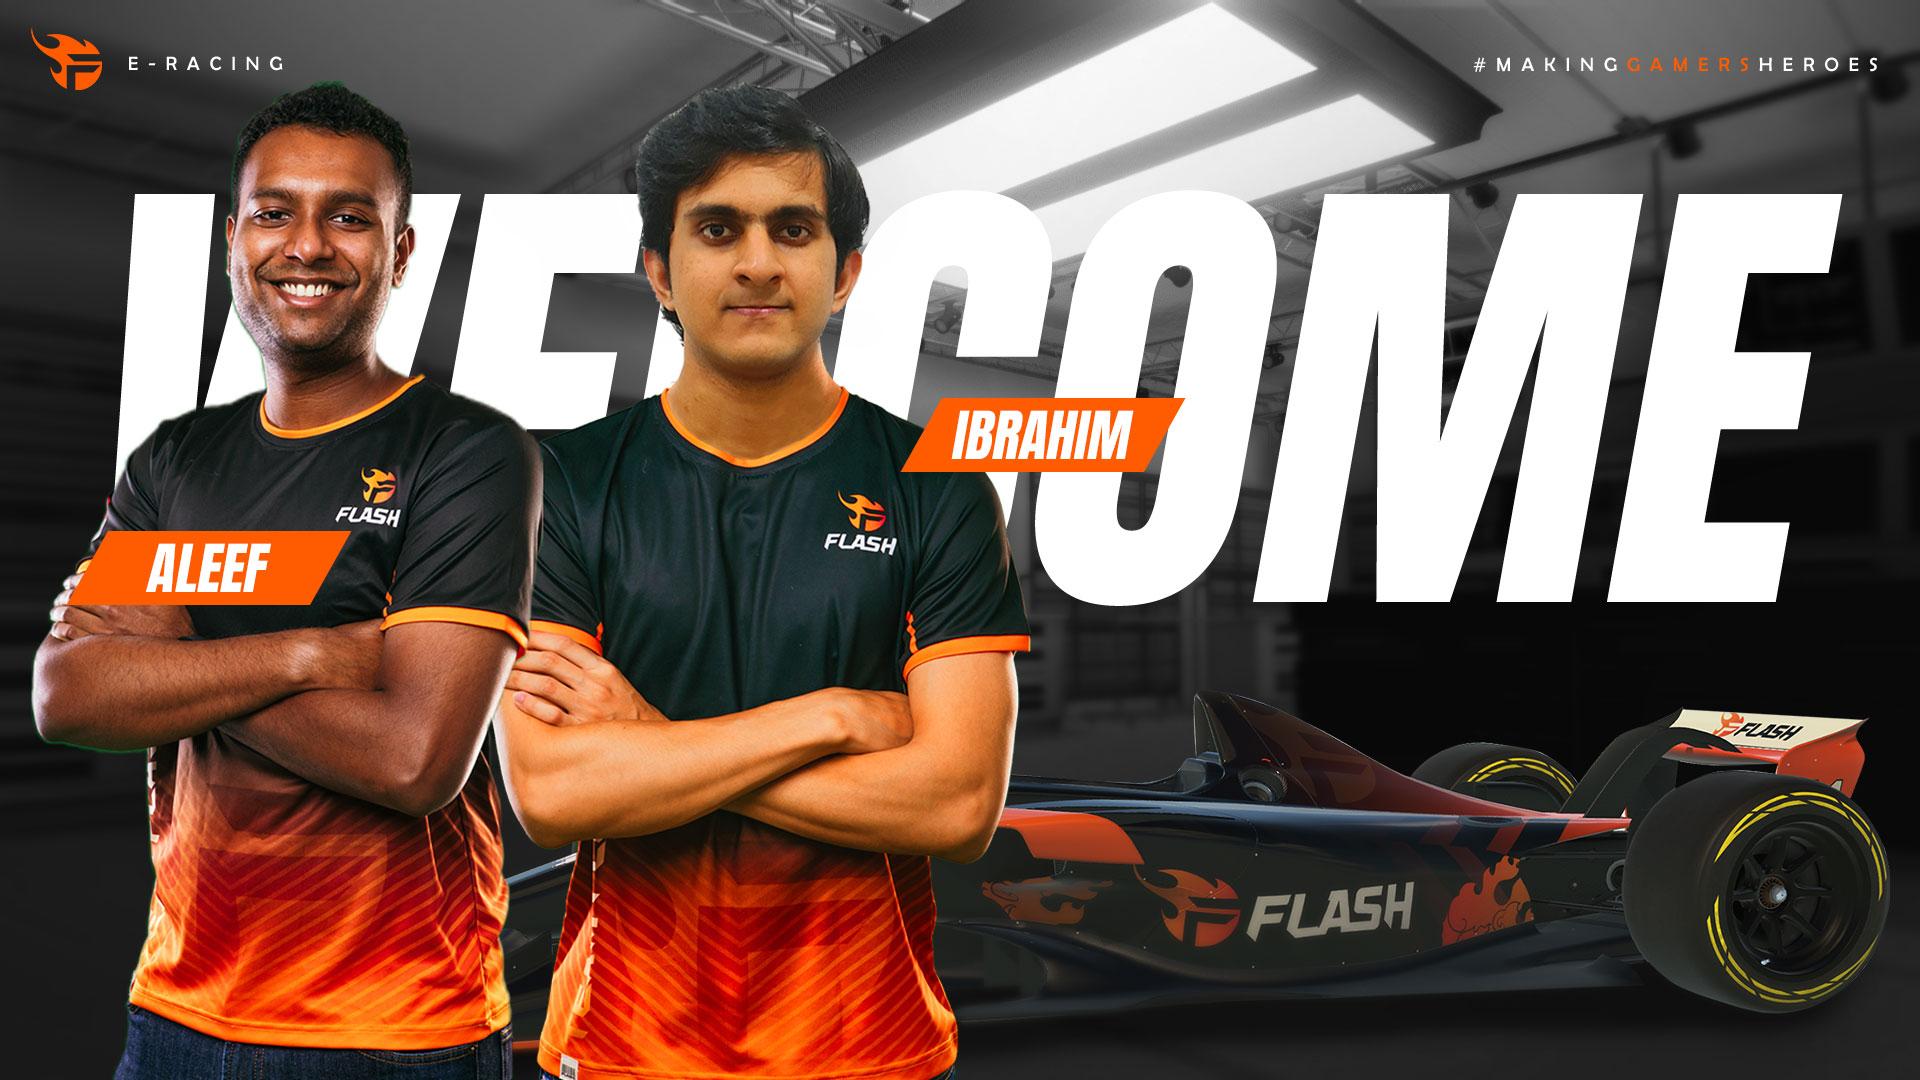 Team Flash to participate in upcoming season of E1 Championship